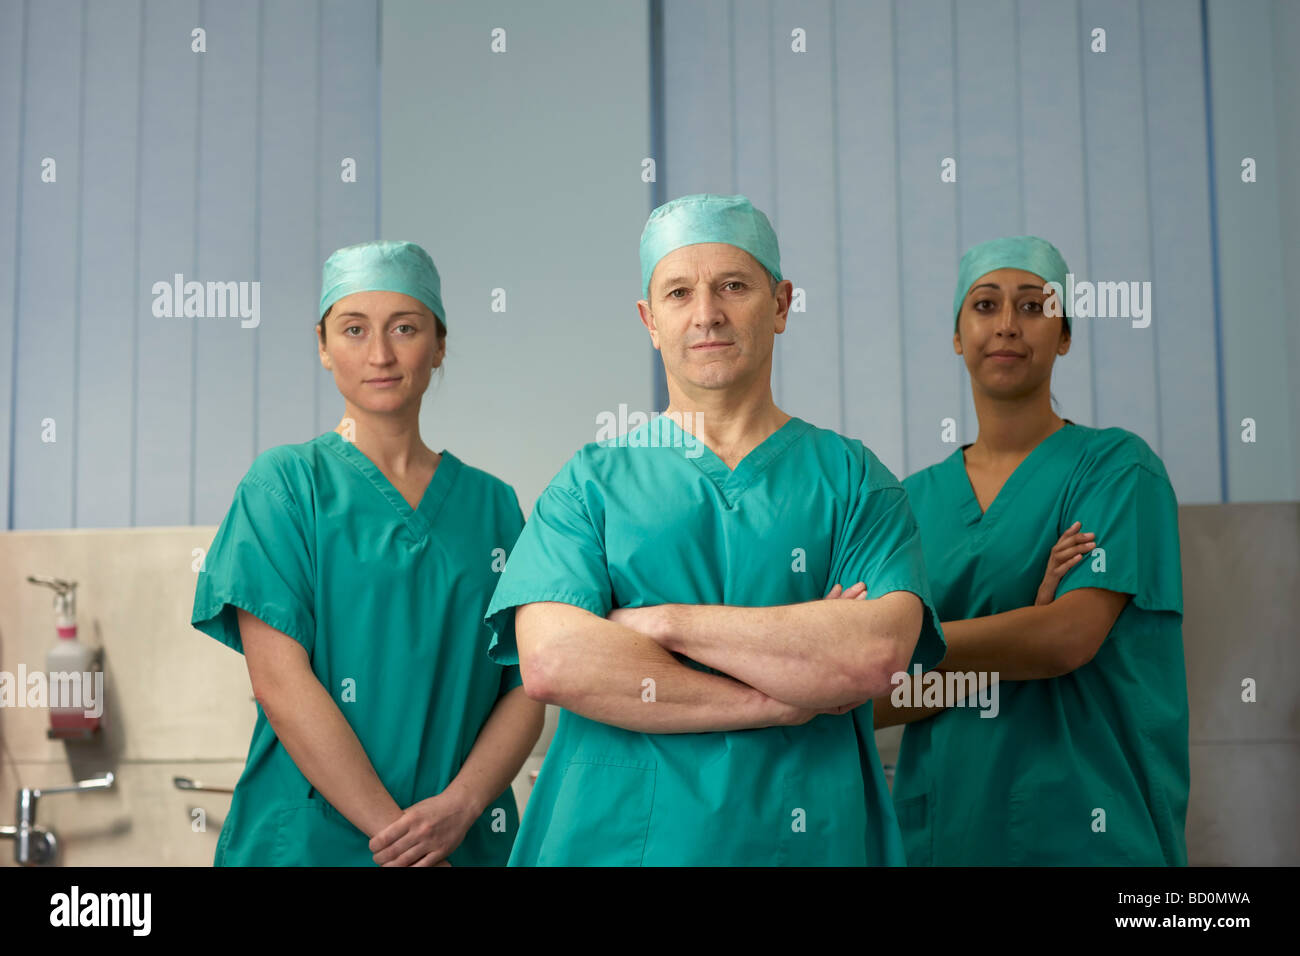 Three medical staff in scrubs - Stock Image